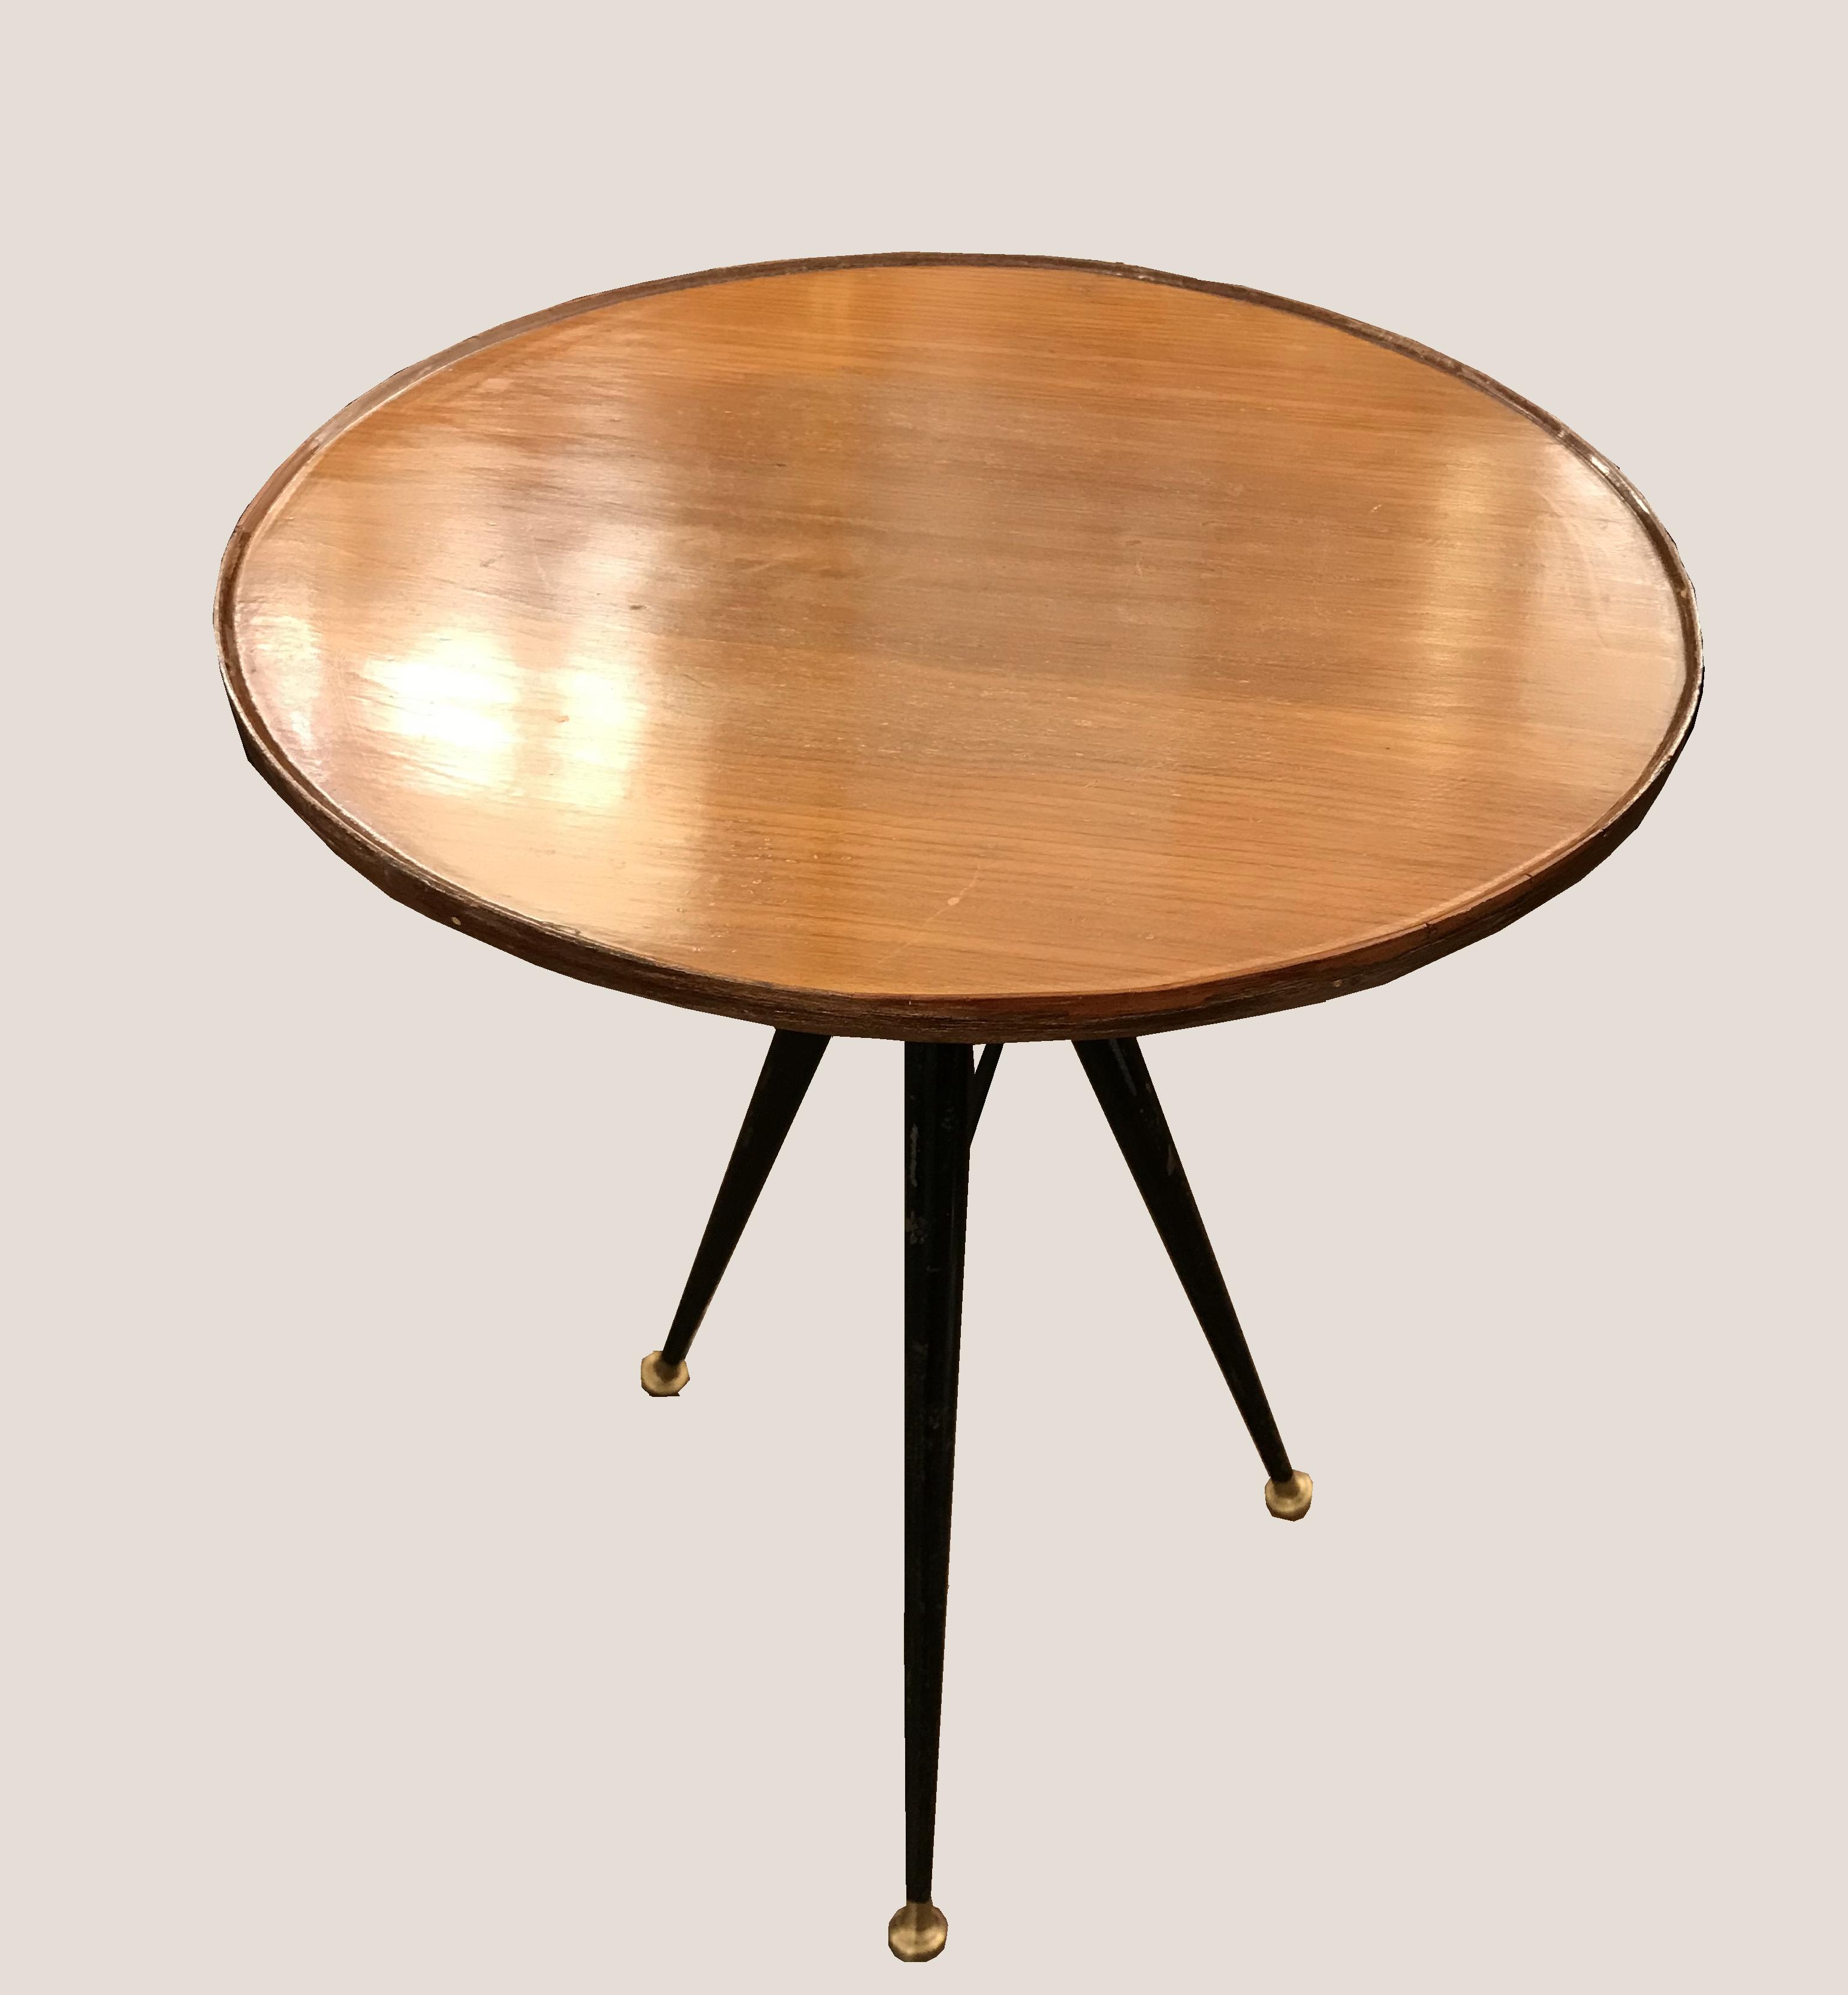 table basse ou guéridon